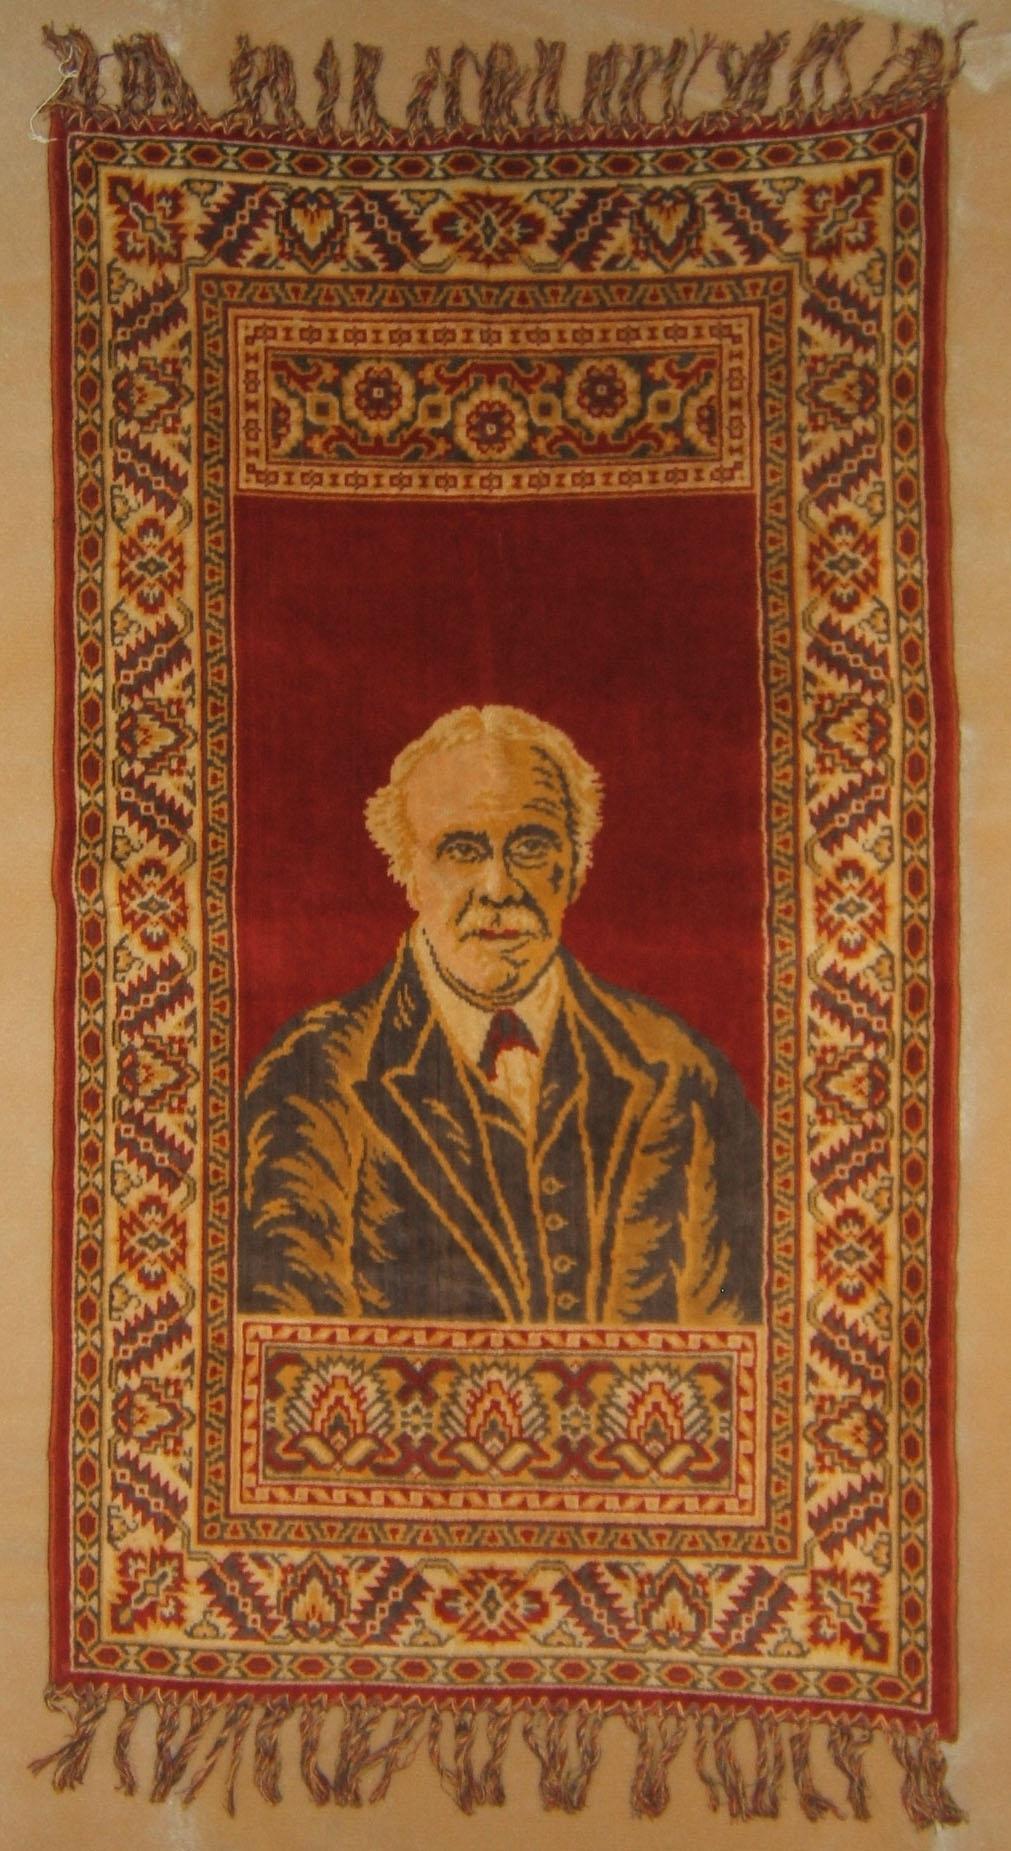 Palestine/E.I. Arthur Balfour Jewish rug, circa. 1917-1920